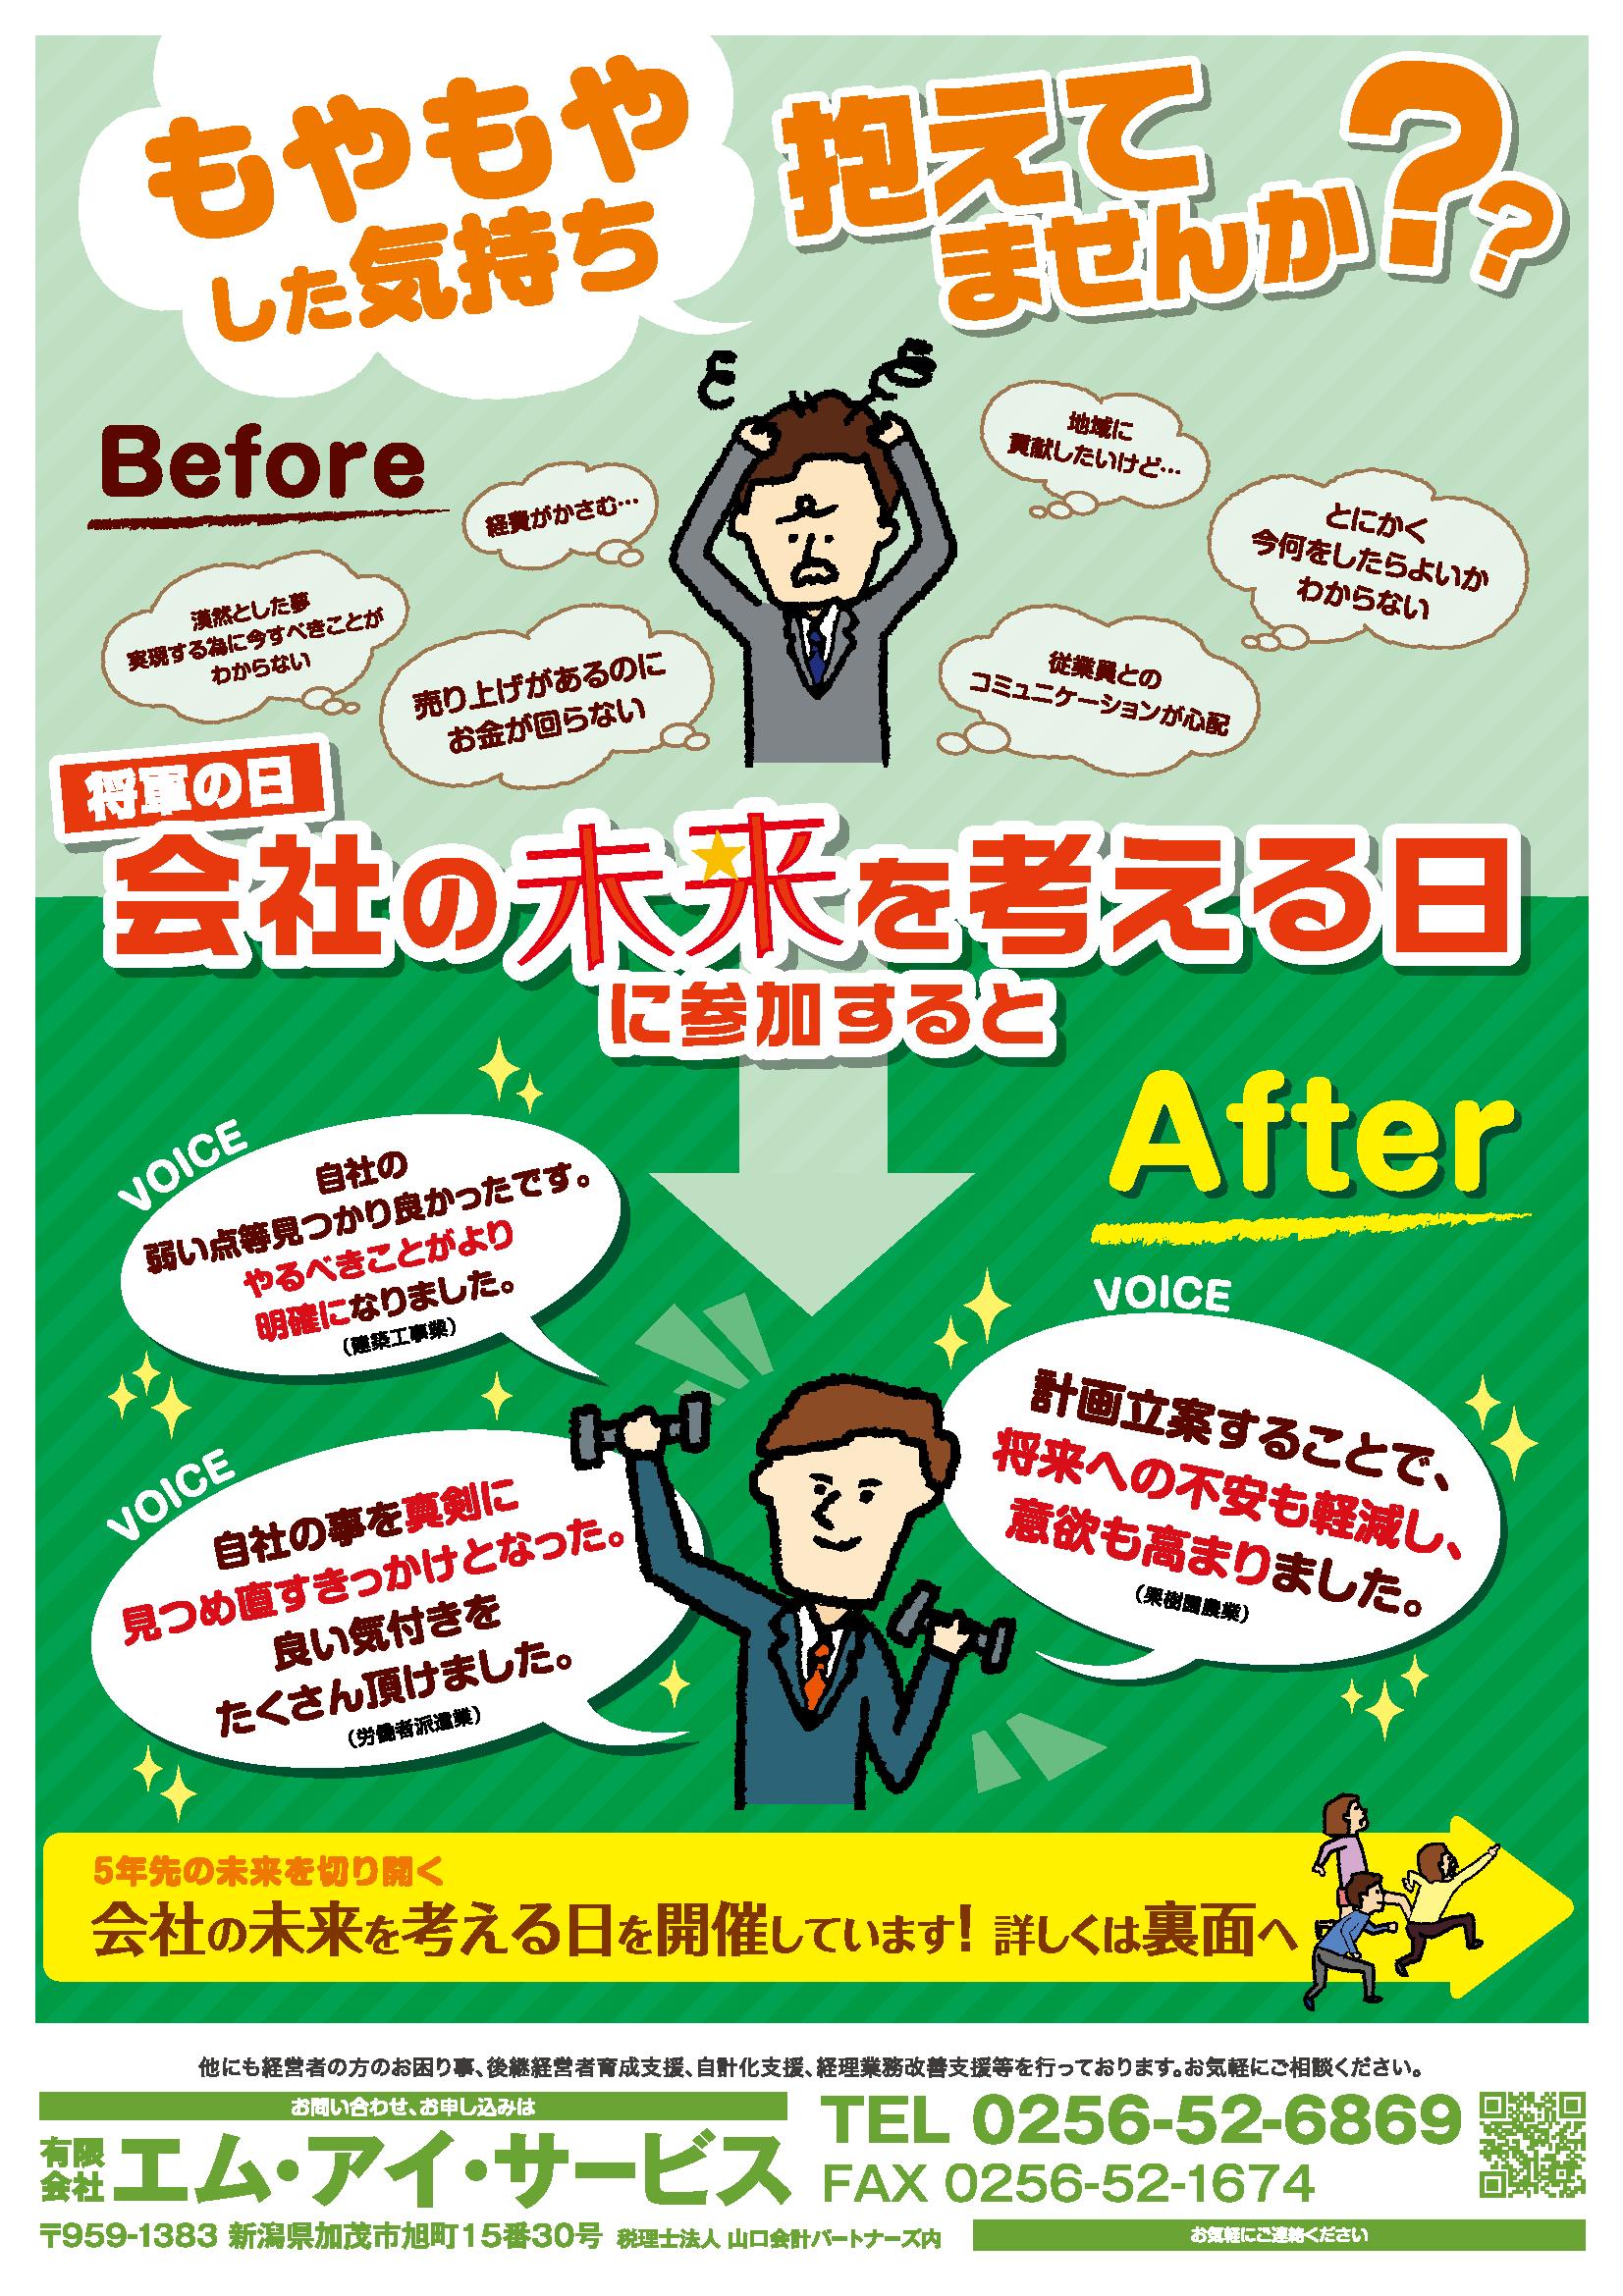 seminar202002-21-01